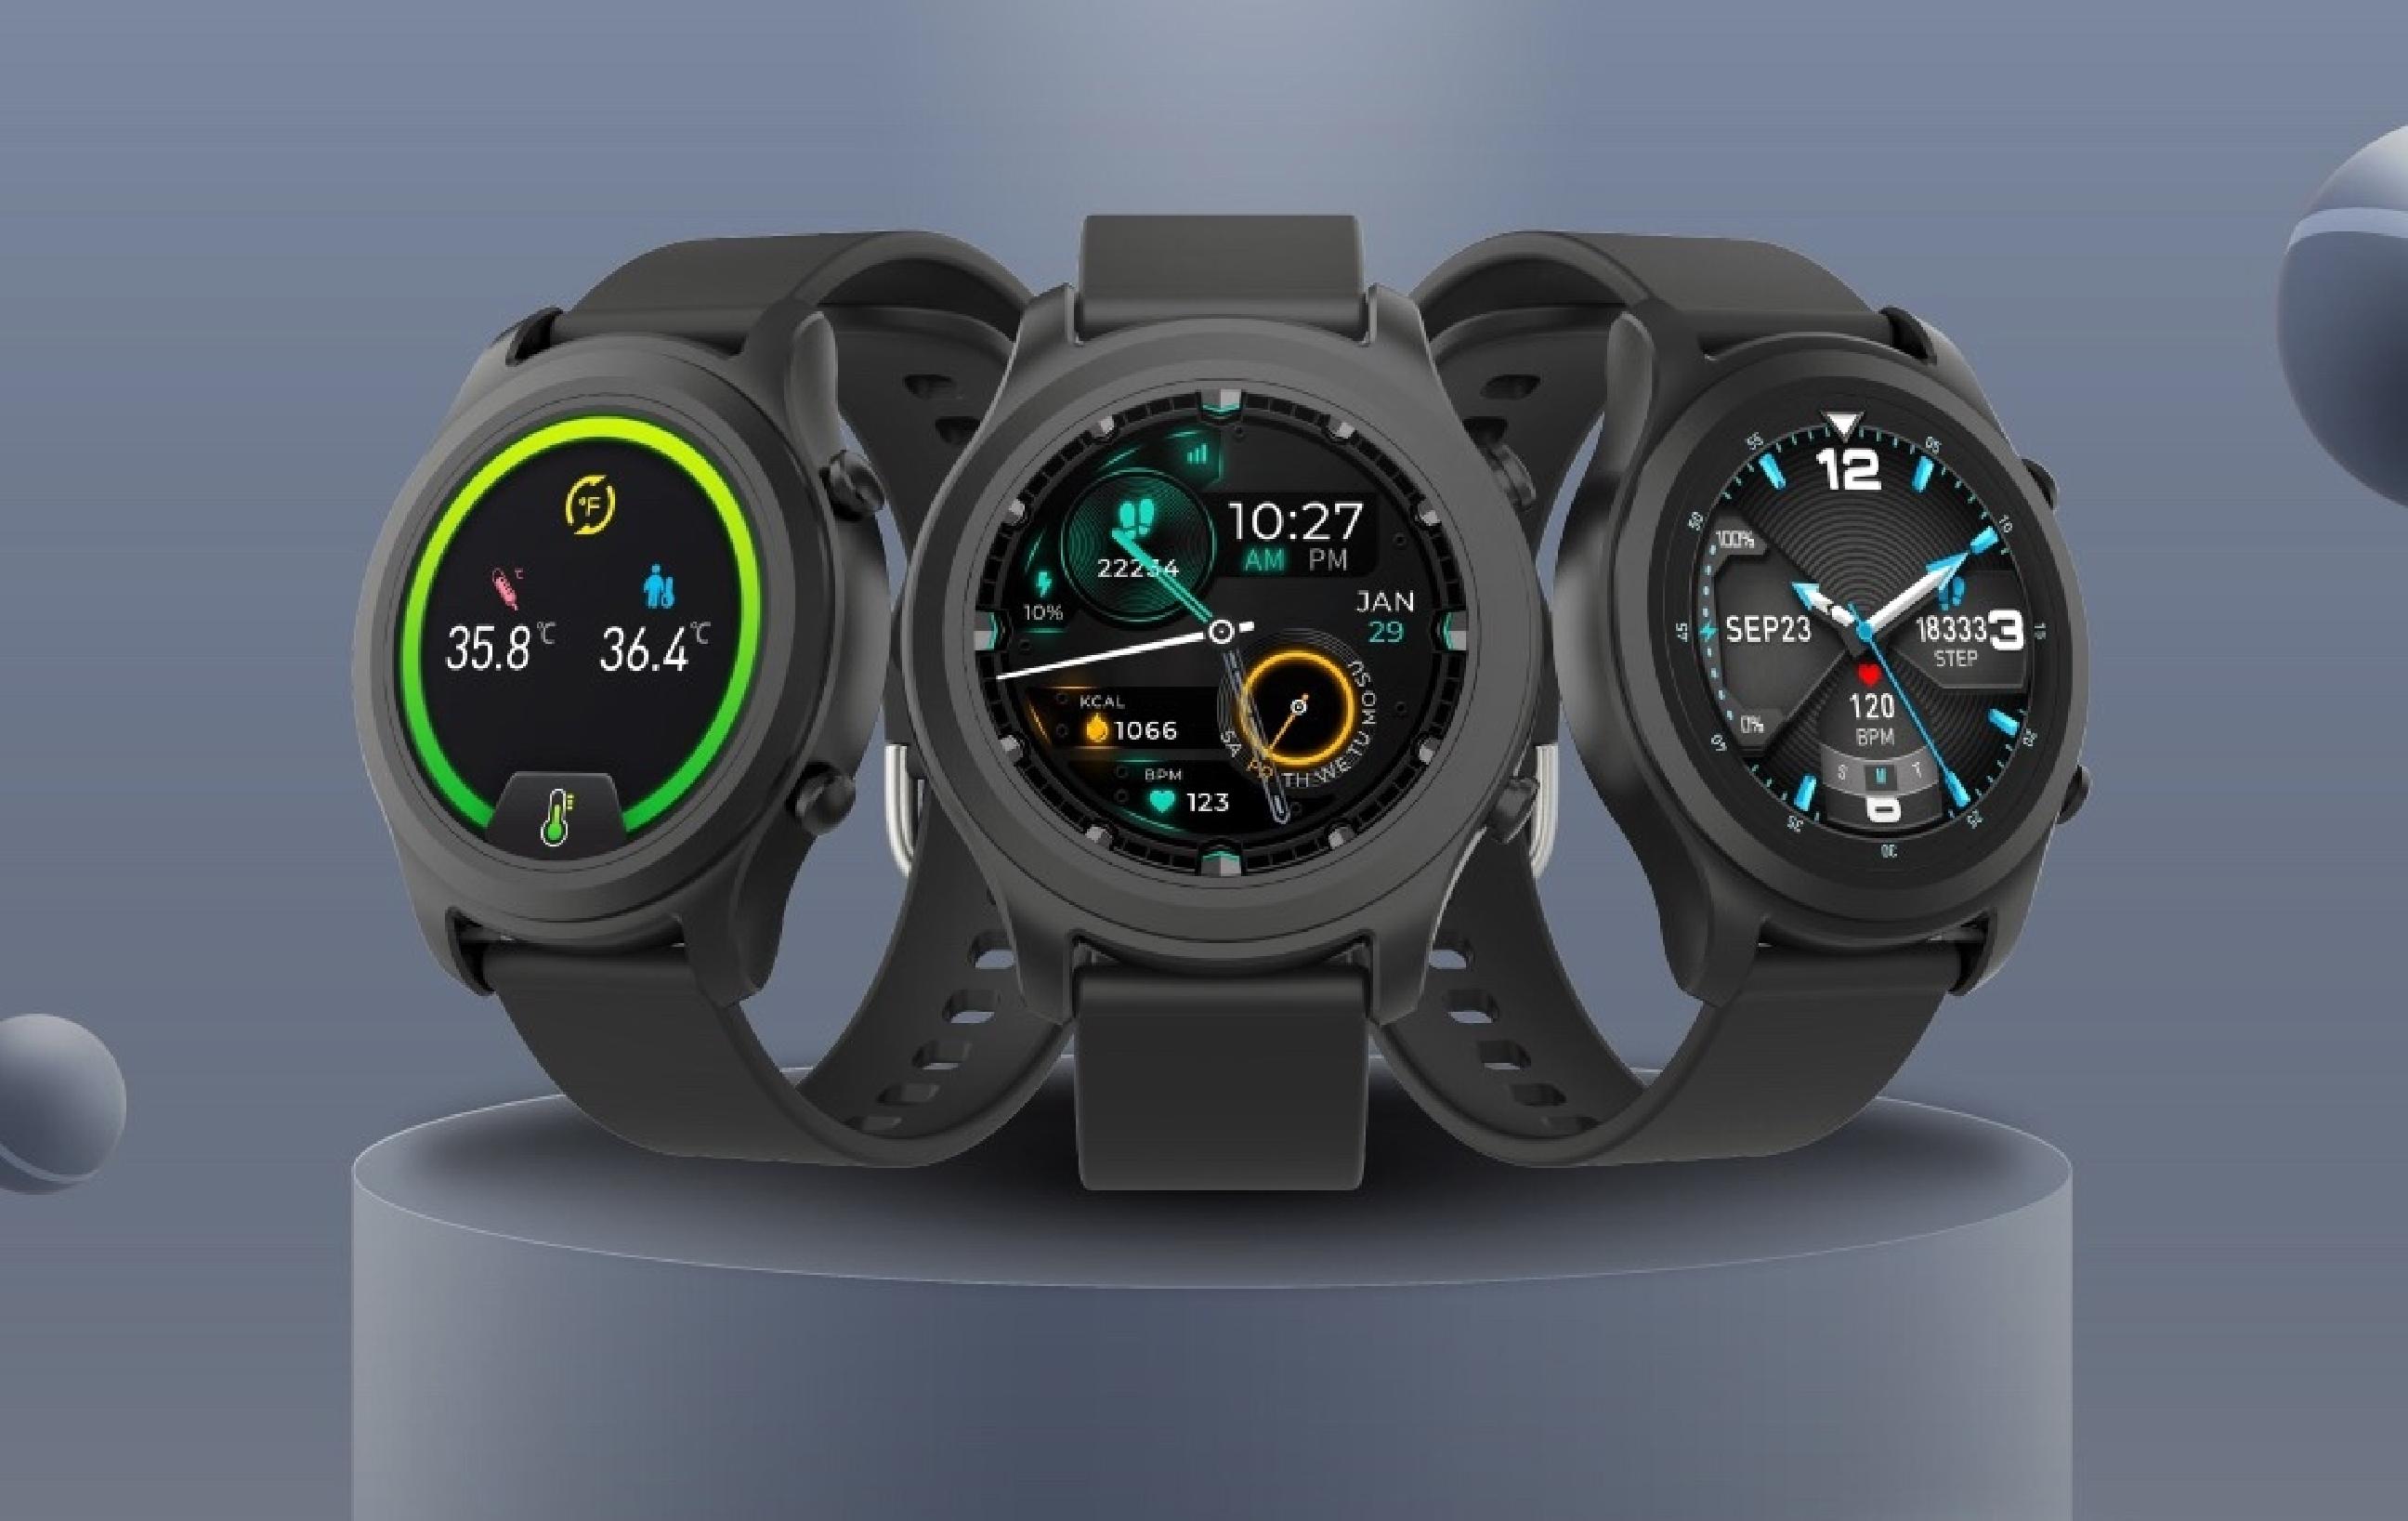 OASE siap luncurkan smartwatch anyar, monitor suhu tubuh sekali swipe